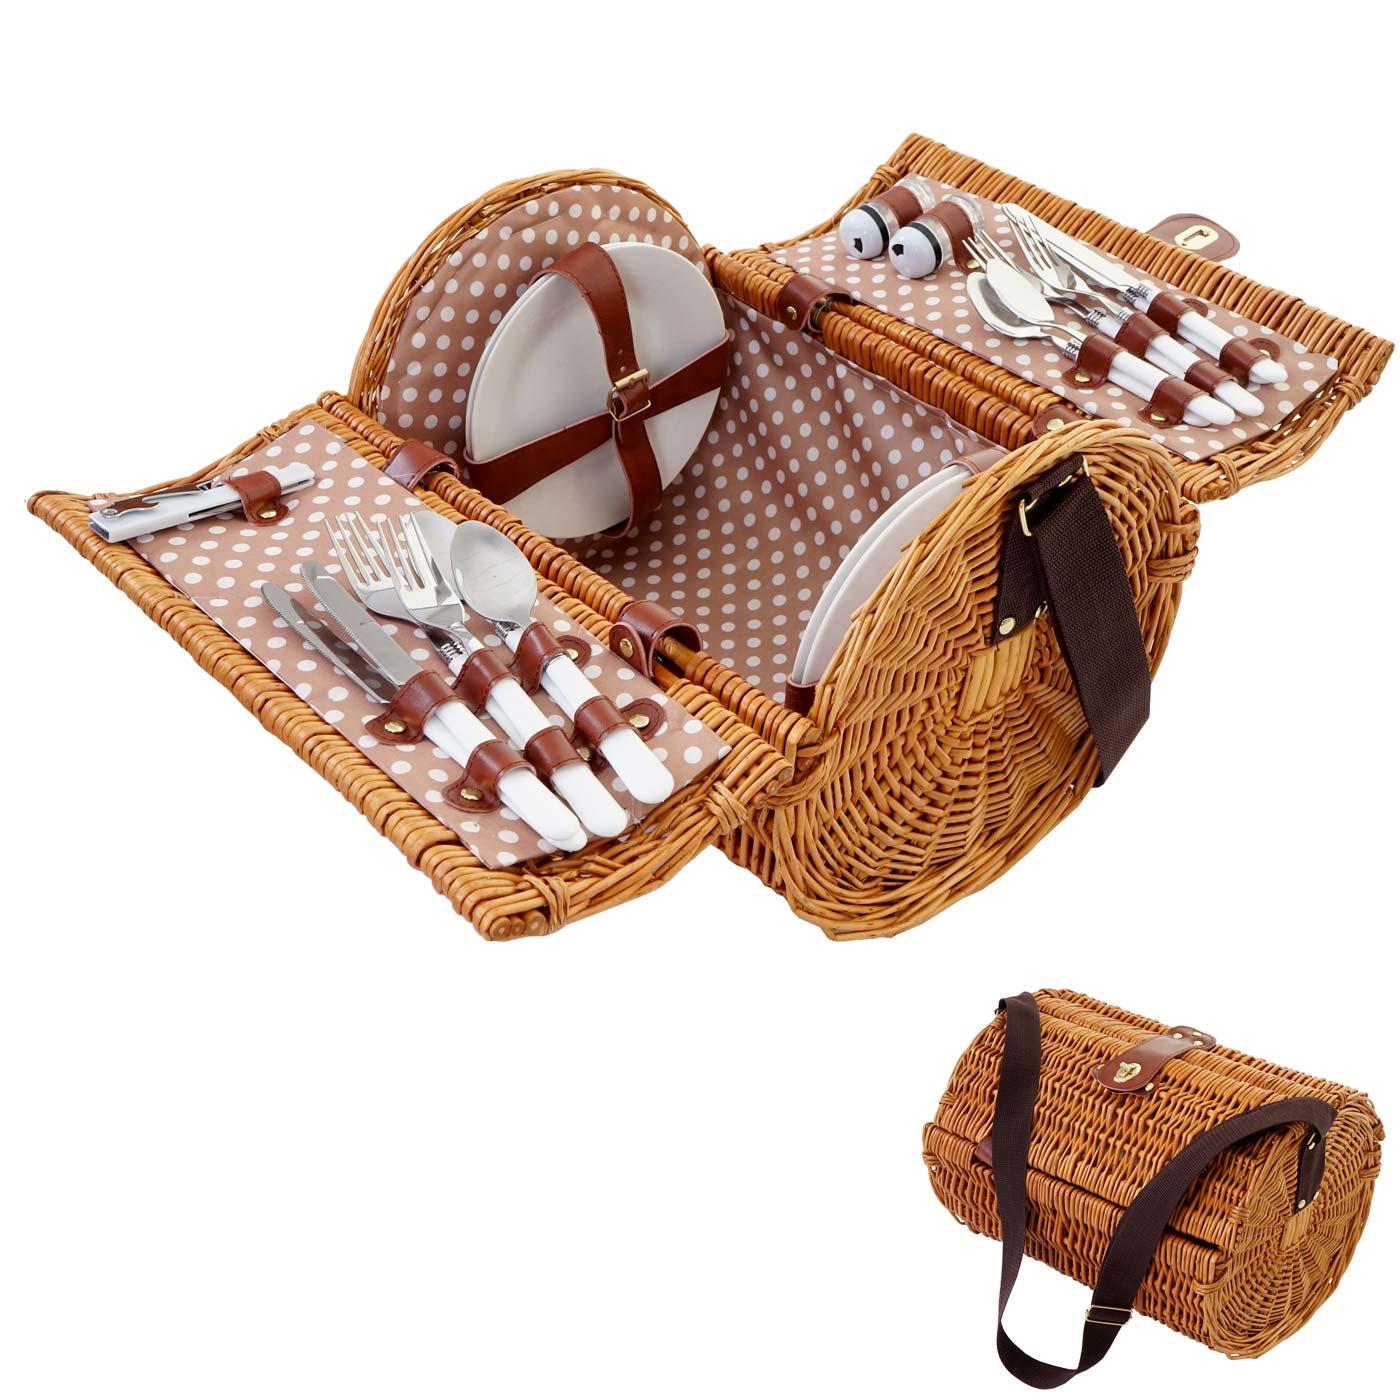 picknickkorb set f r 4 personen picknicktasche weiden. Black Bedroom Furniture Sets. Home Design Ideas